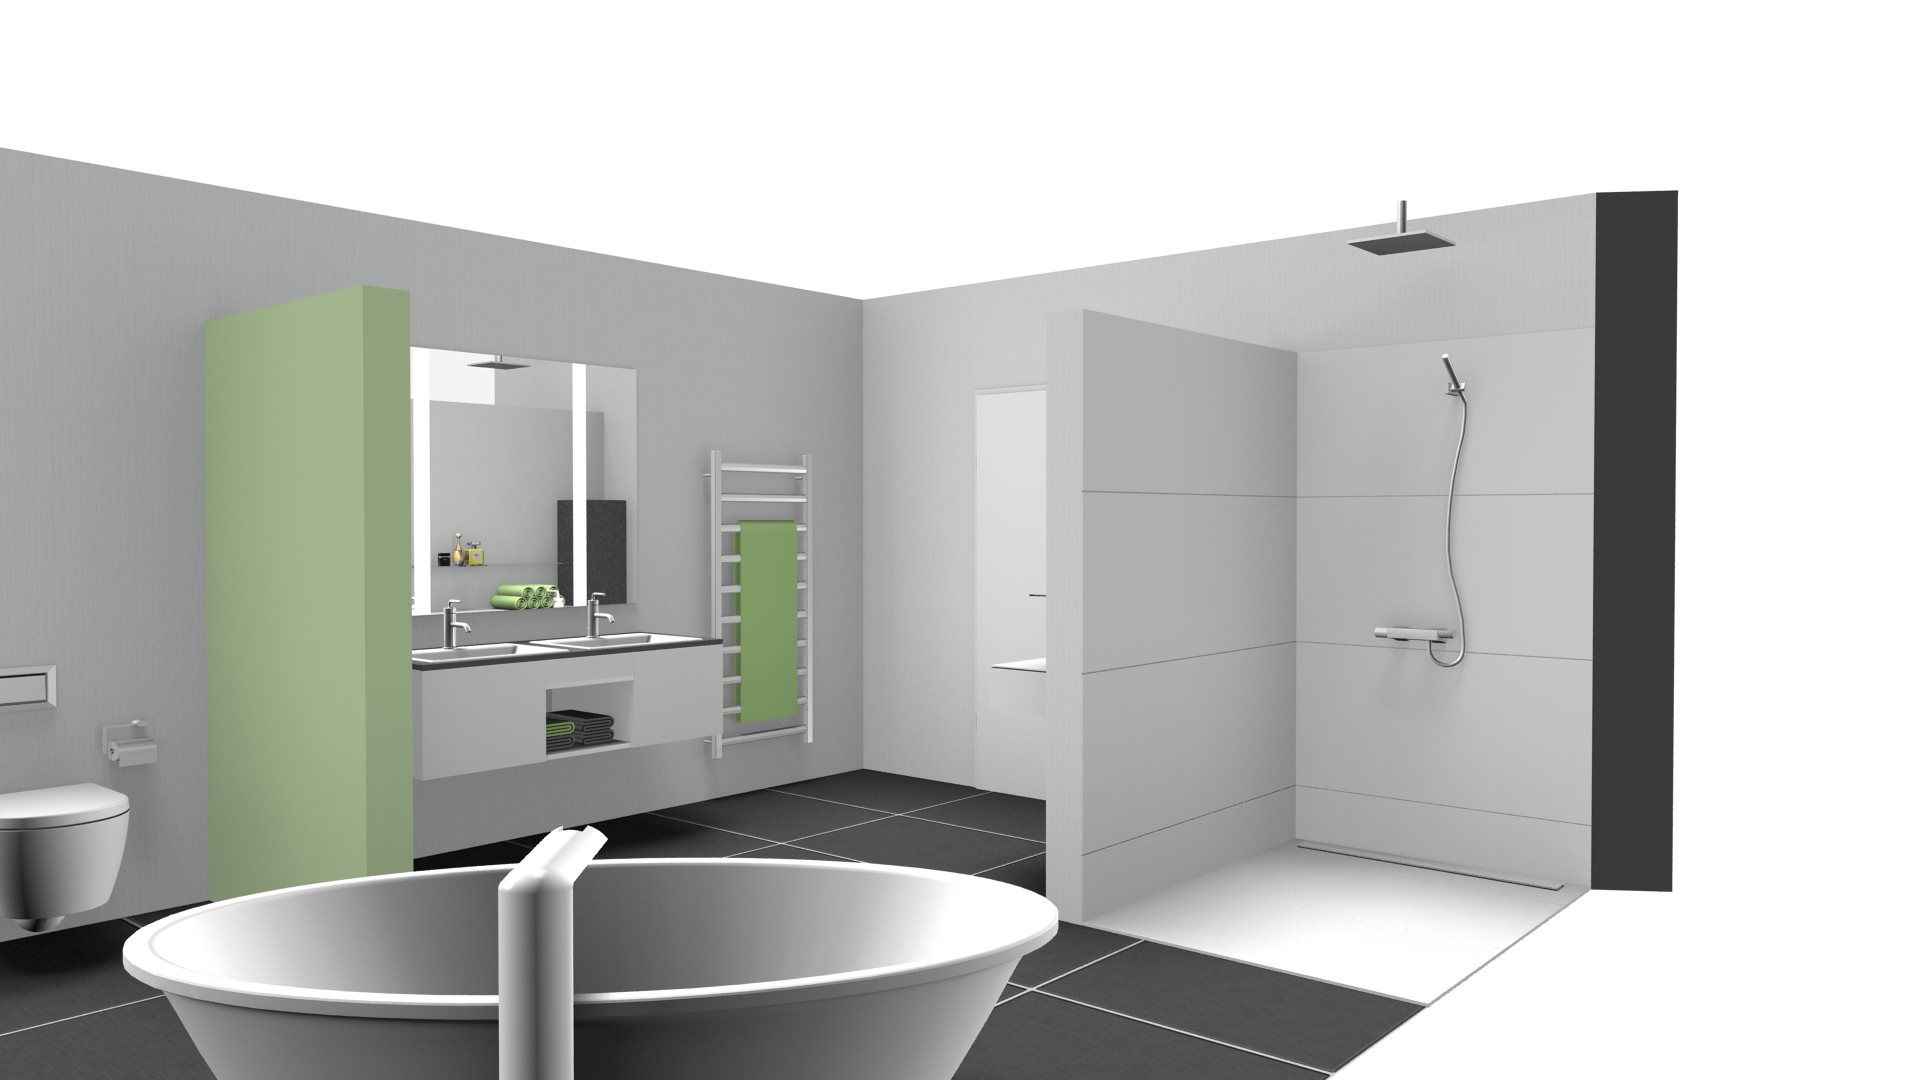 actica GmbH – actica planen & einrichten » 3D-Planung Bad